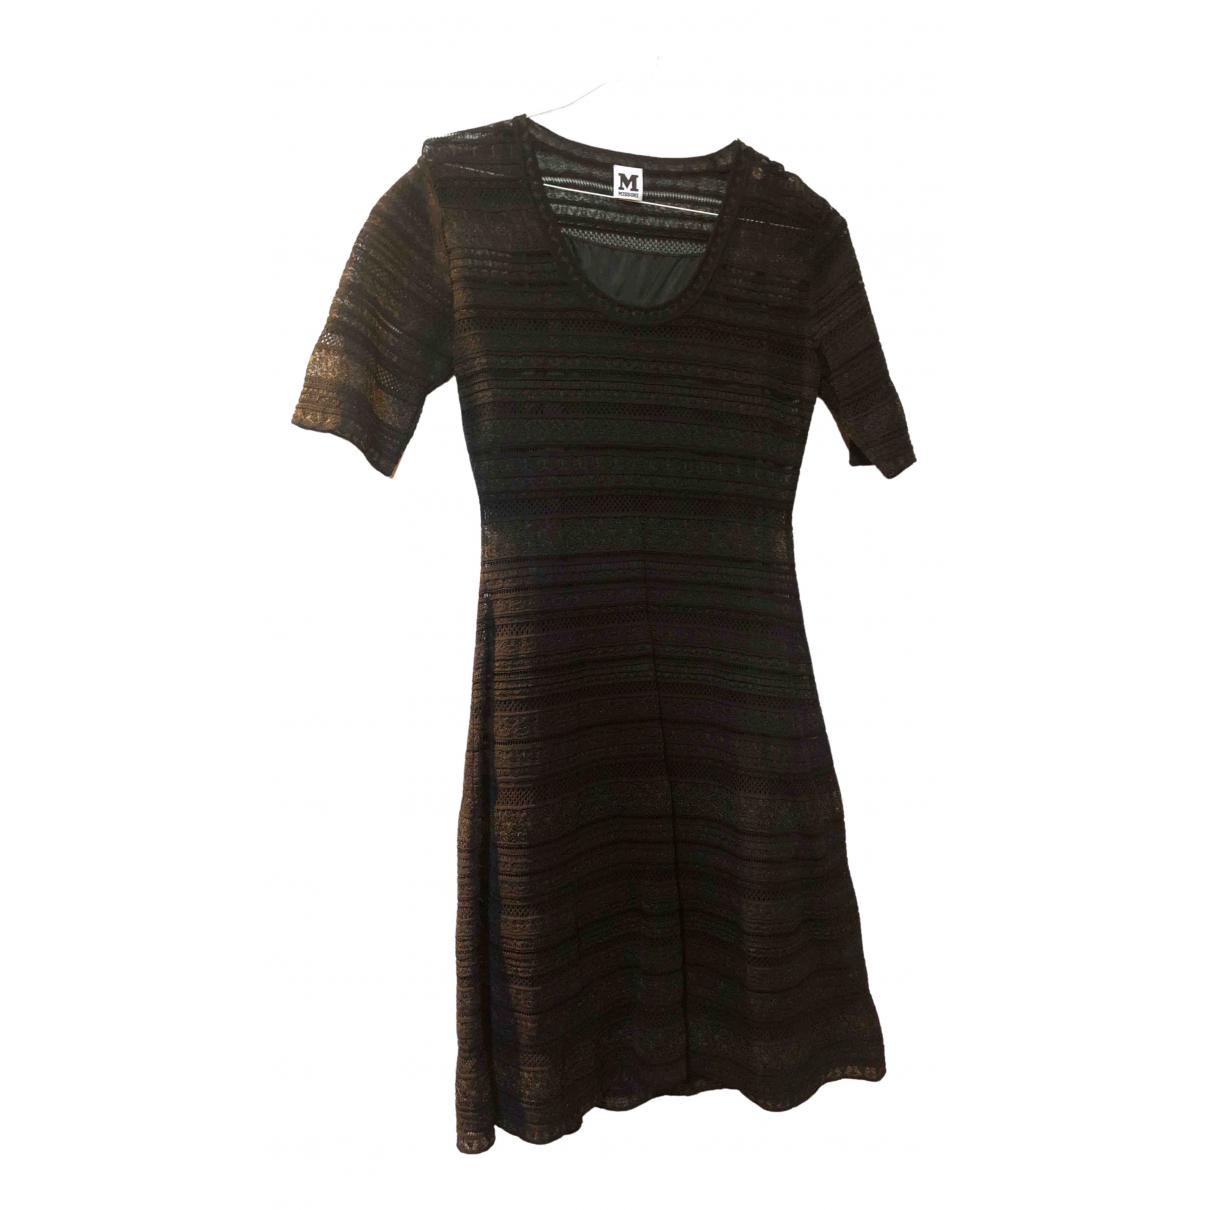 M Missoni \N Black Cotton dress for Women 44 IT